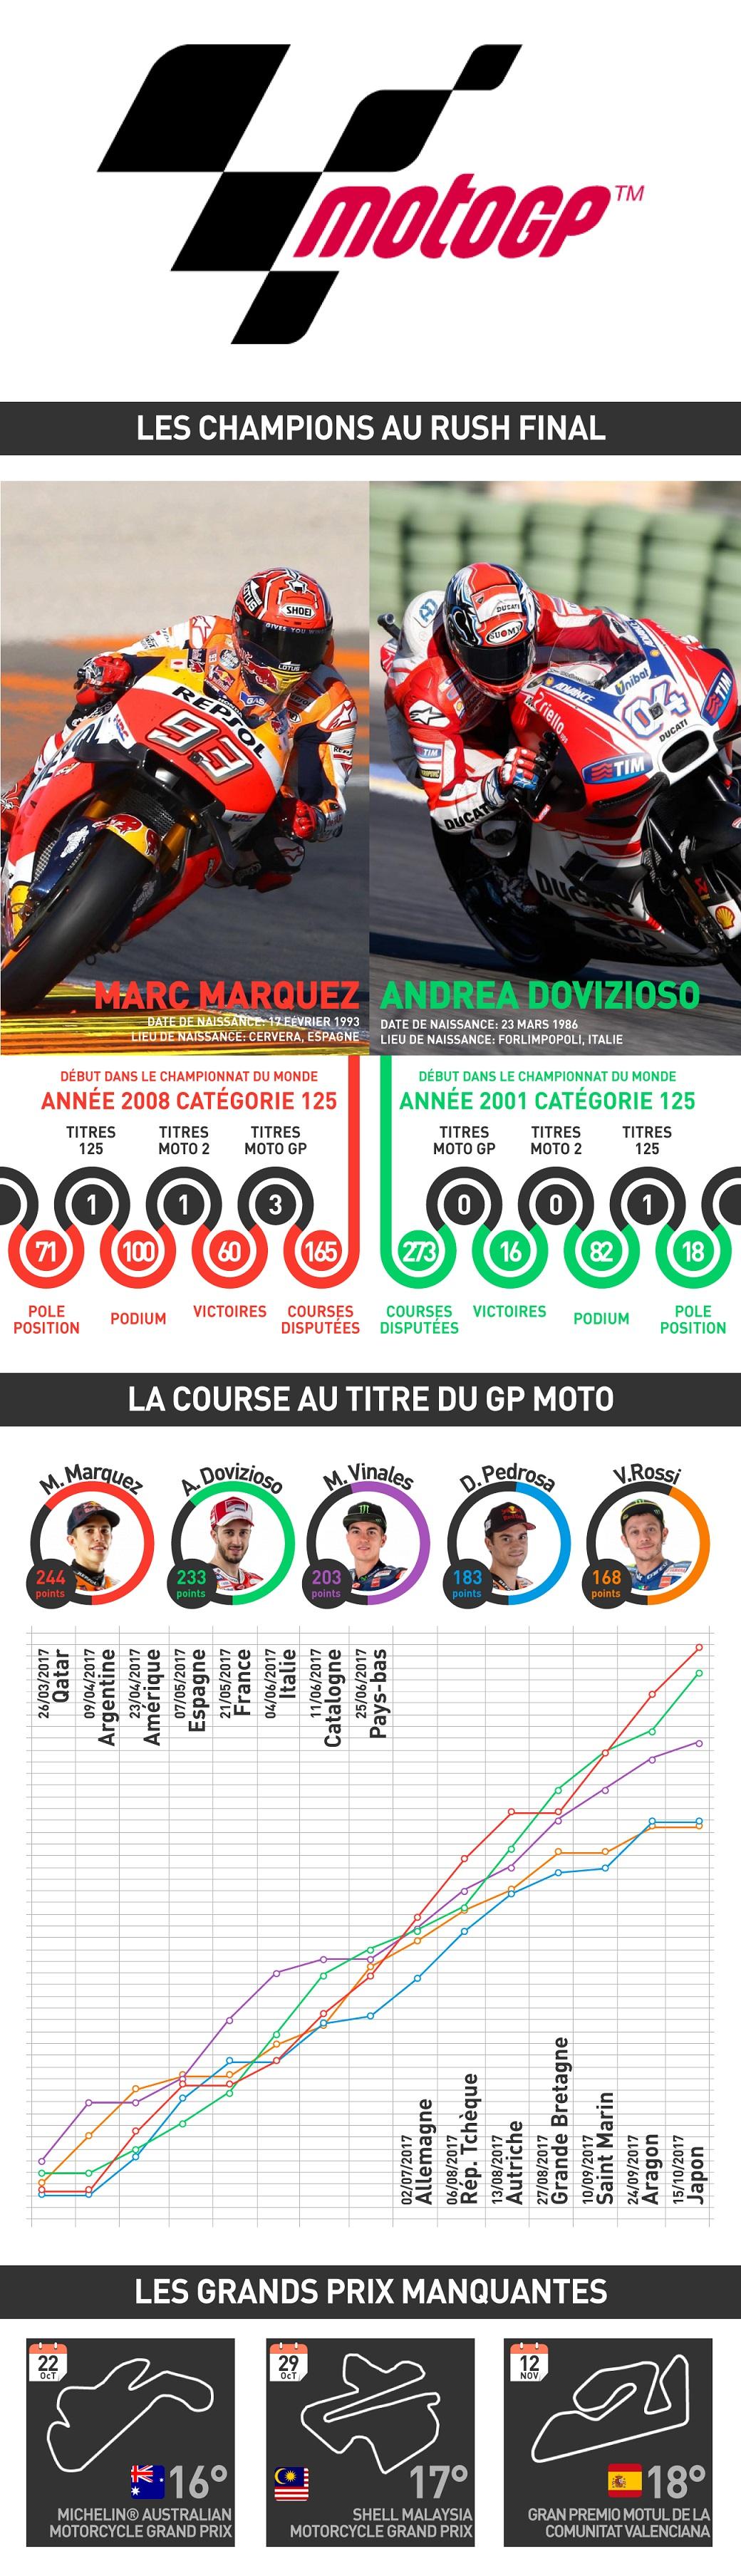 motogp 2017 infographie